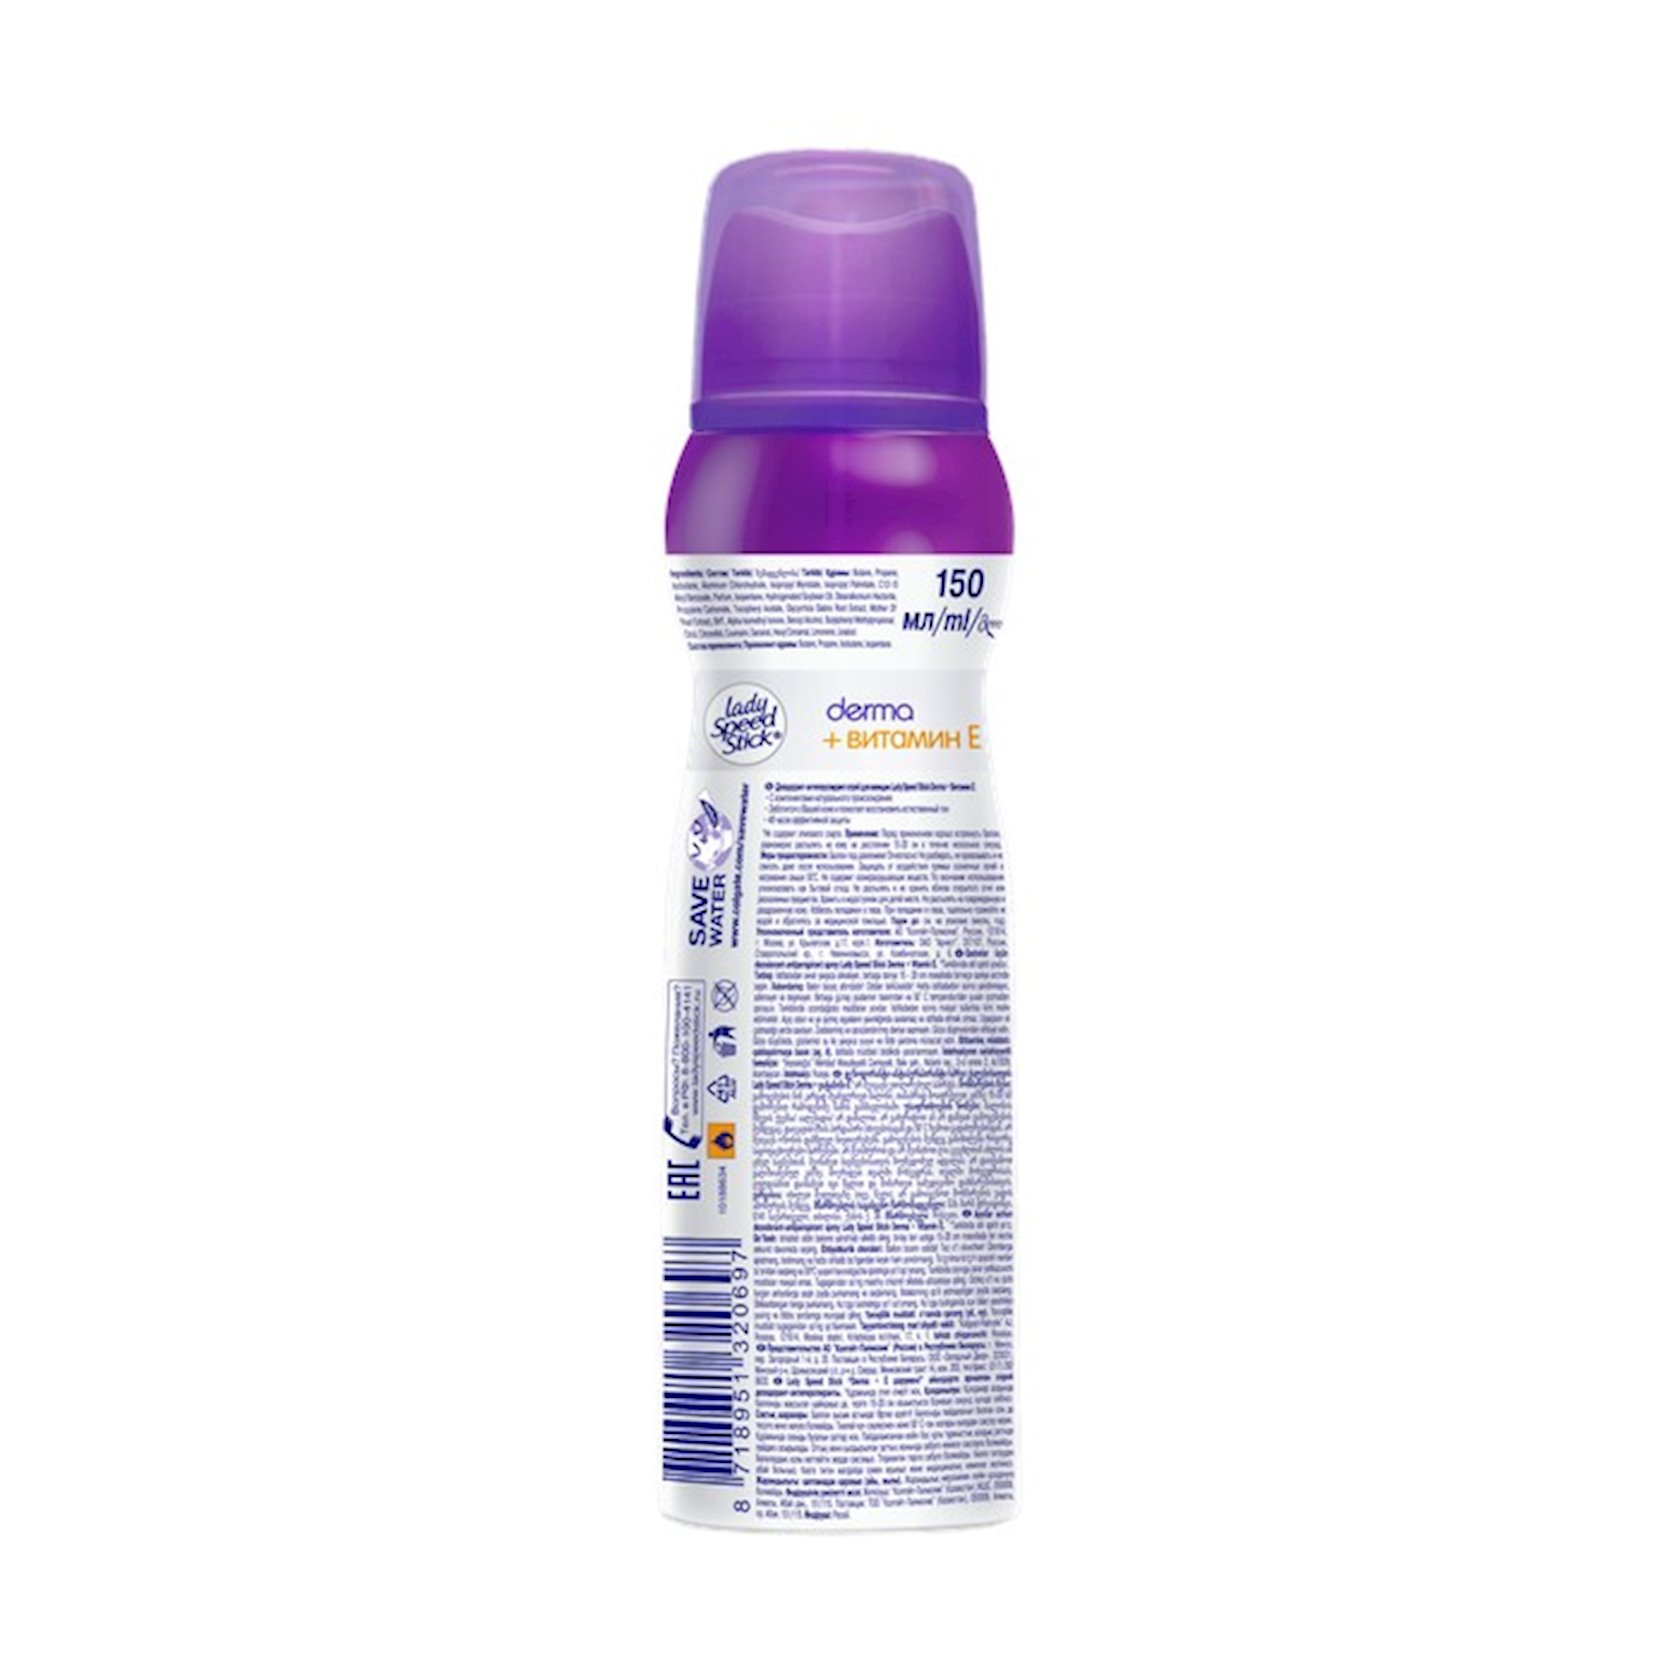 Dezodorant sprey Lady Speed Stick Derma + E vitamini 150 ml